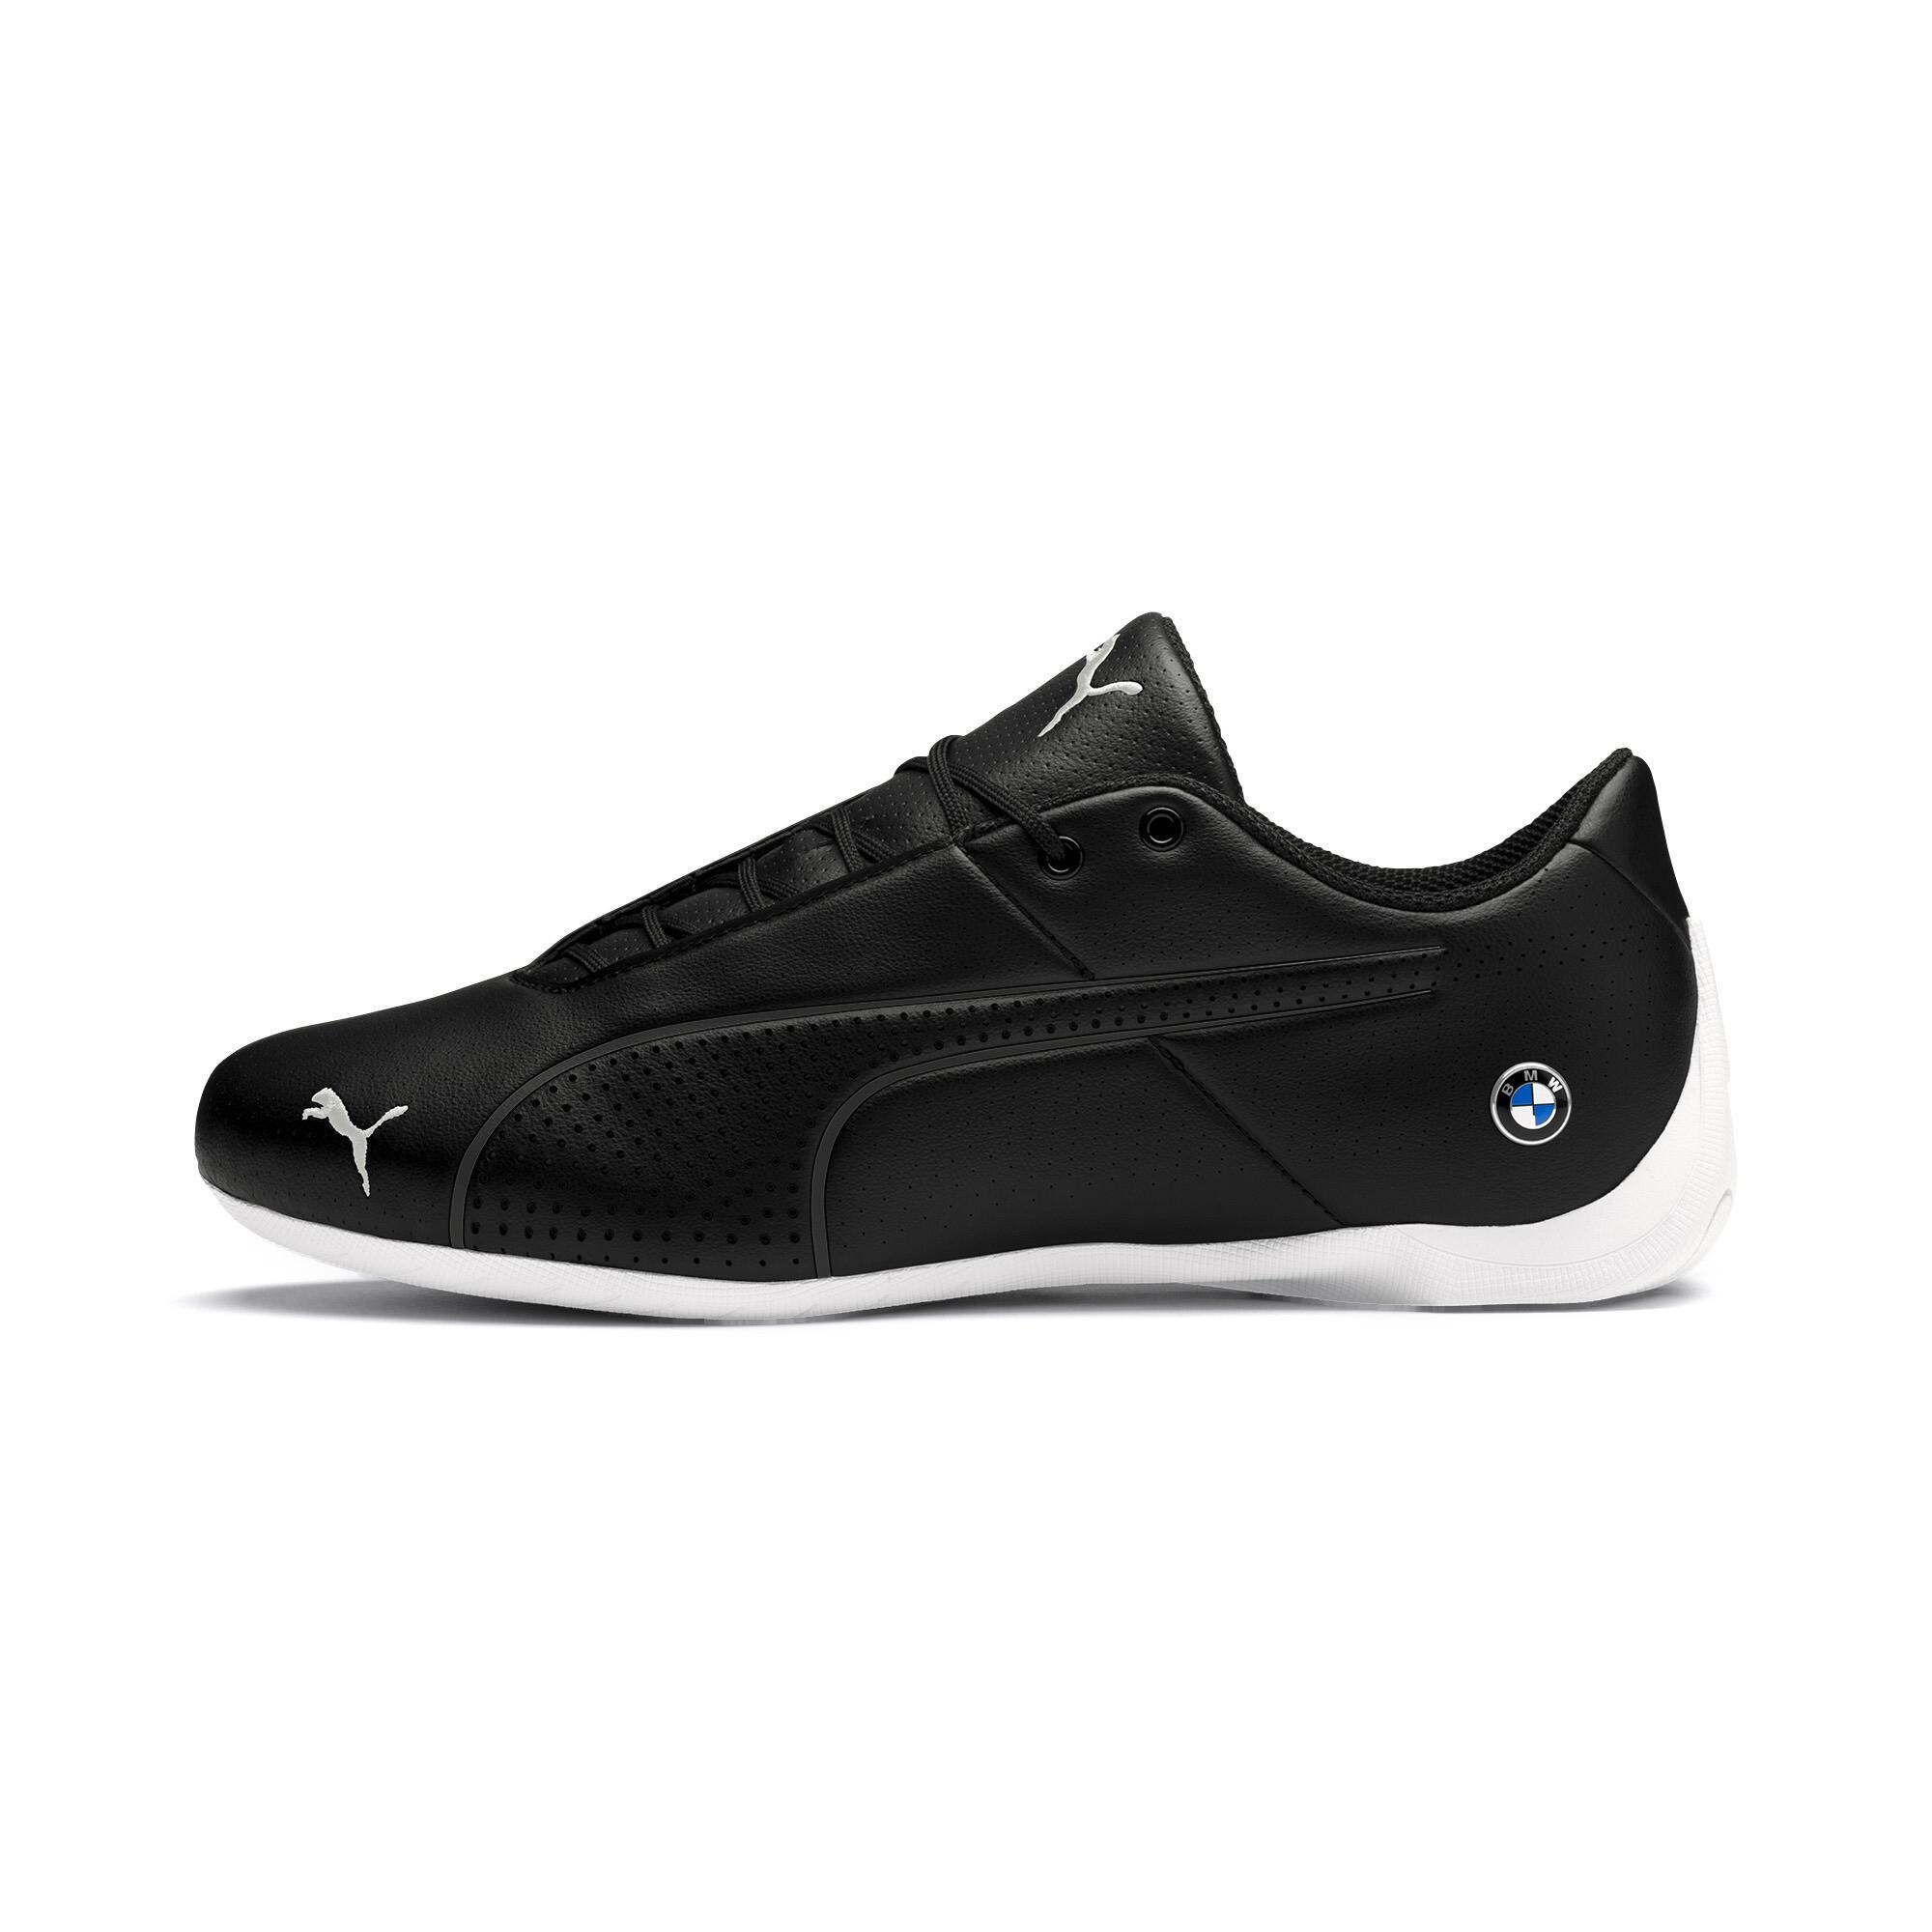 Indexbild 20 - PUMA BMW M Motorsport Future Cat Ultra Sneaker Unisex Schuhe Neu